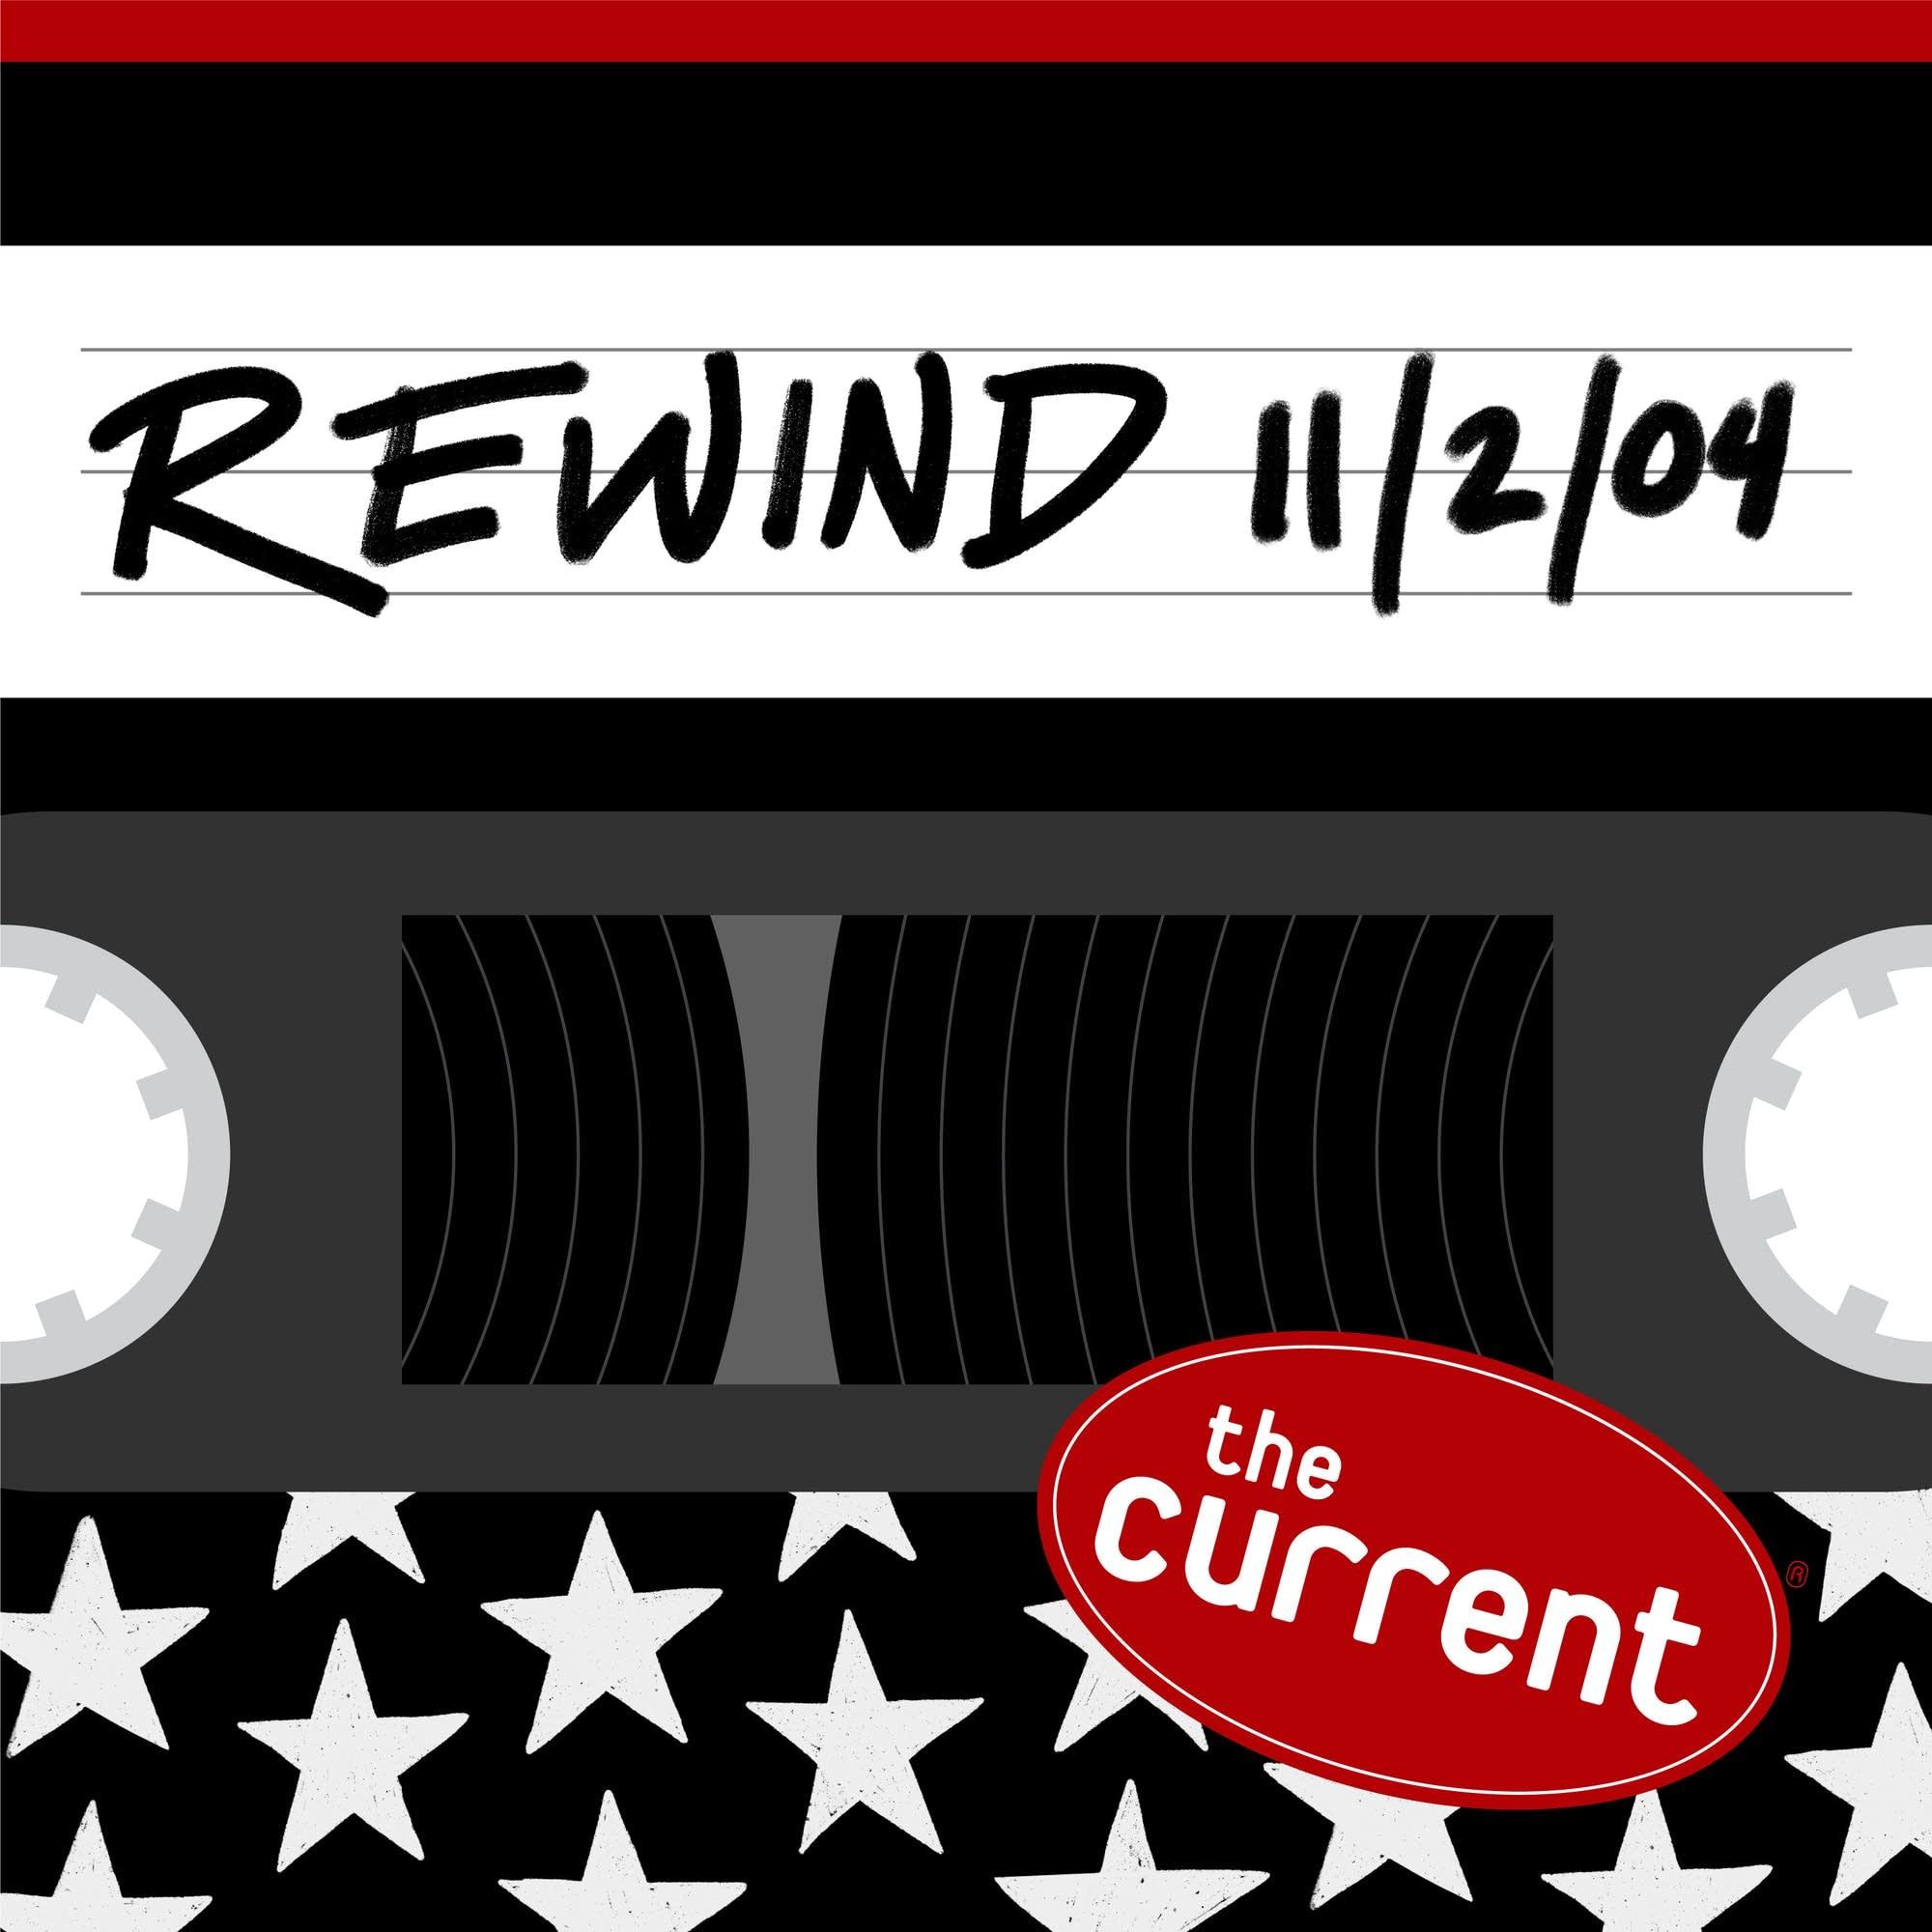 The Current Rewind: 11/02/04